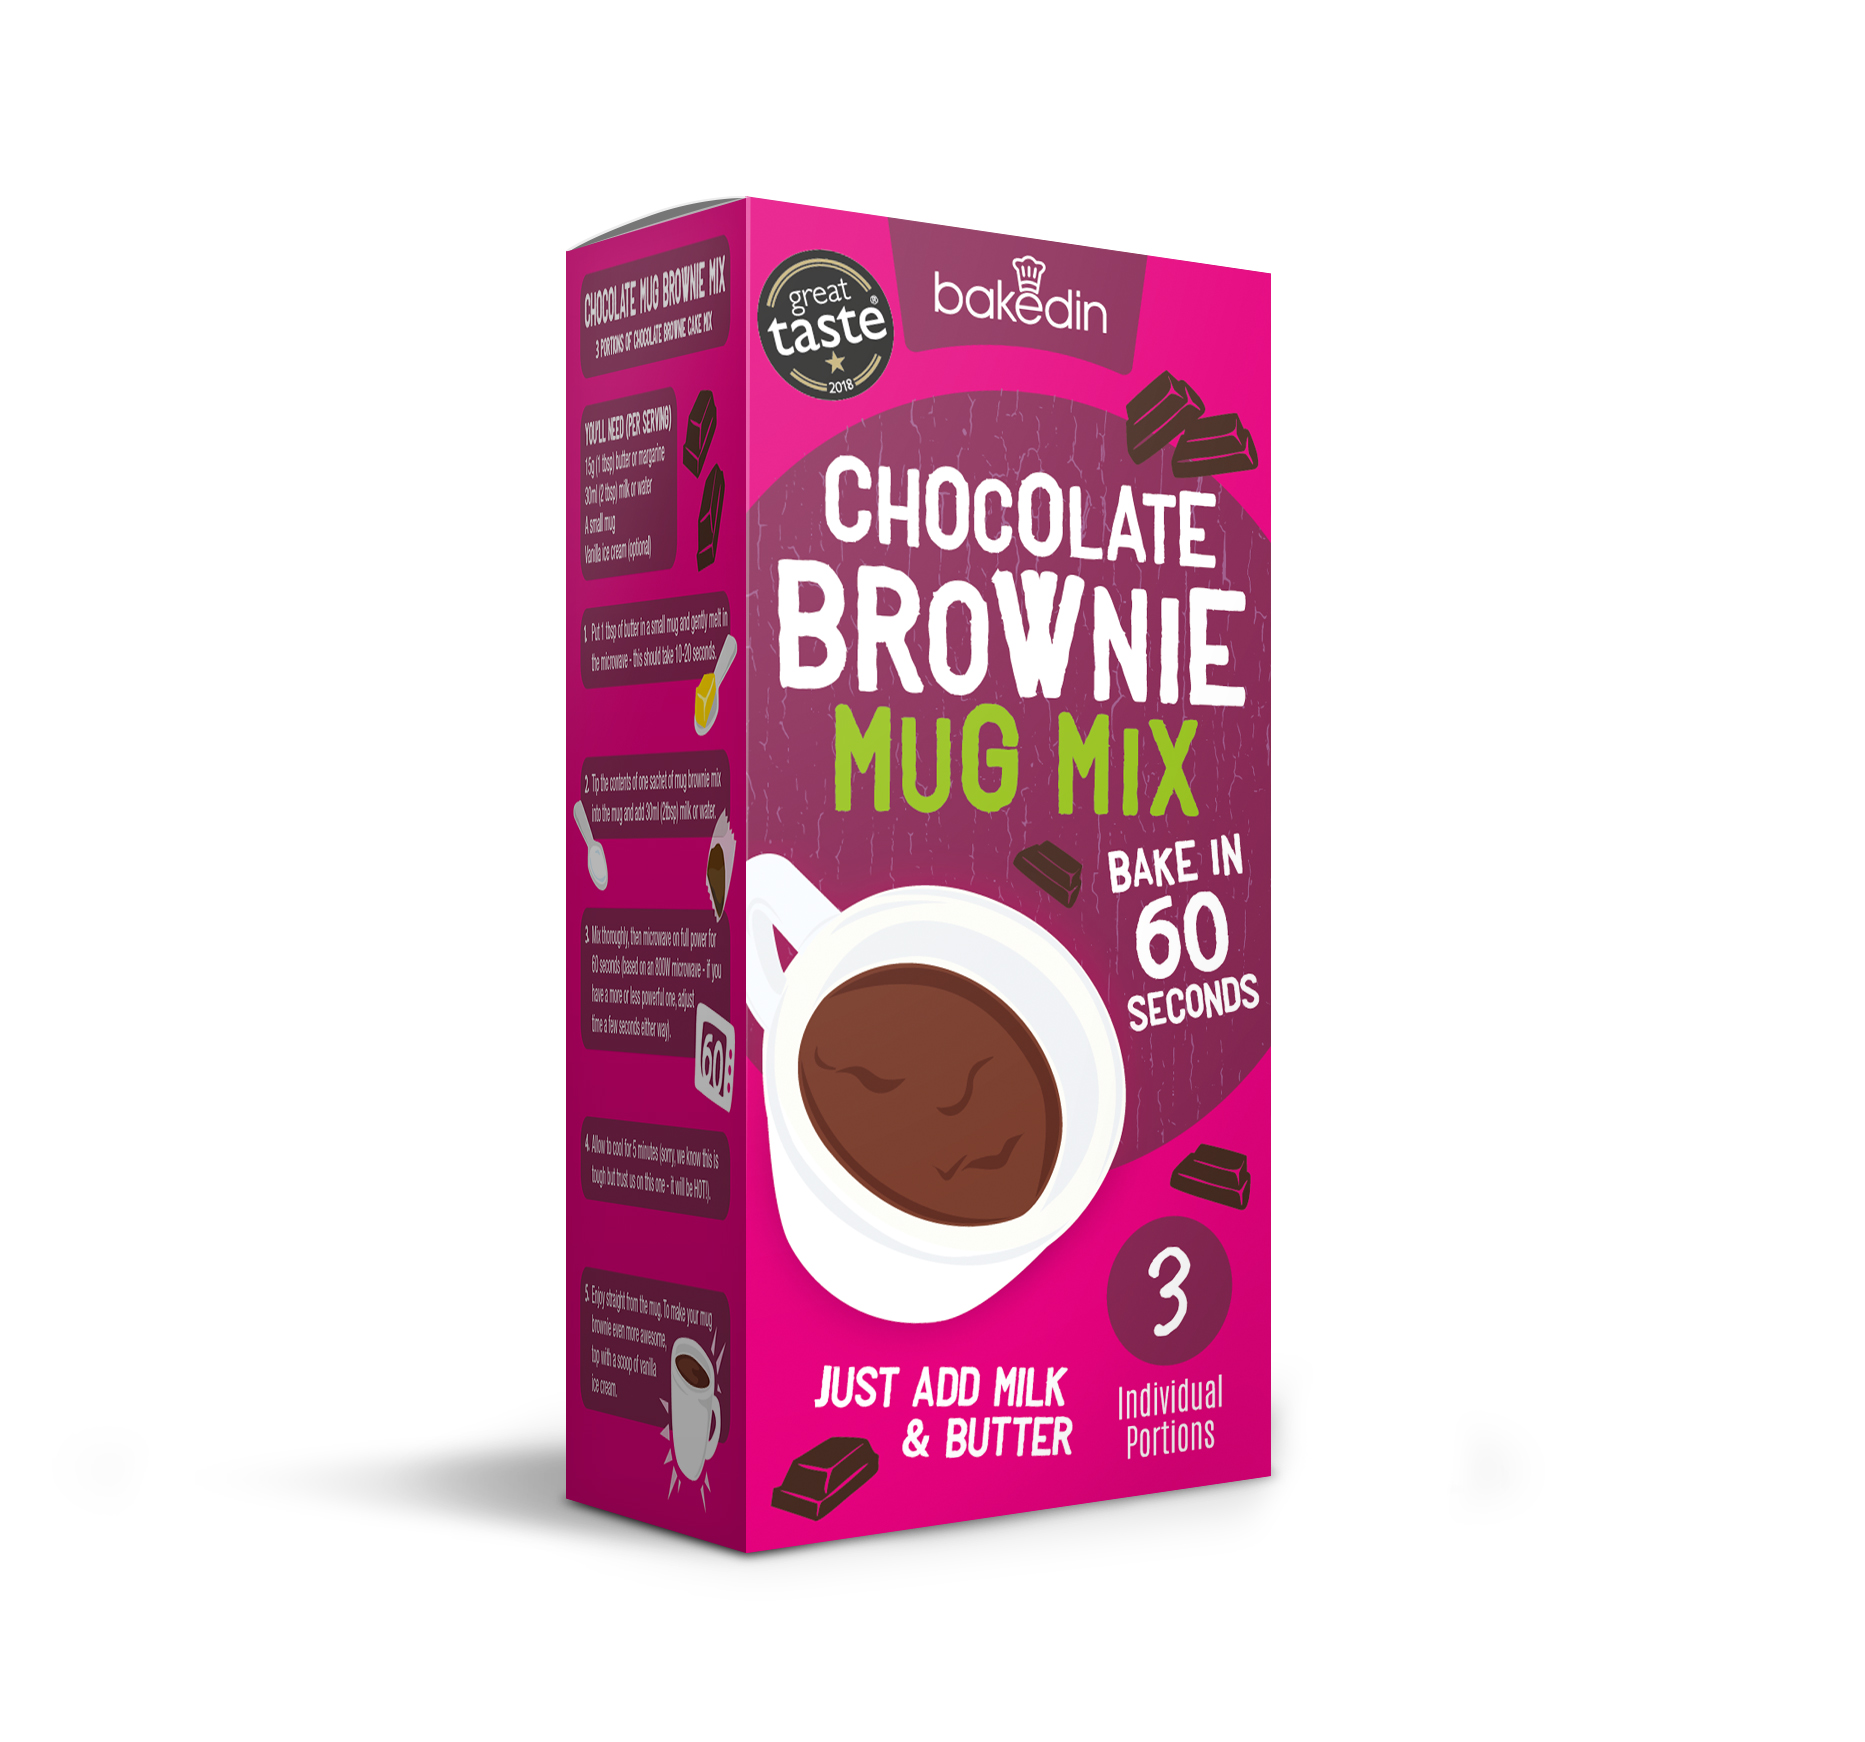 Baked In Chocolate Brownie Mug Mix